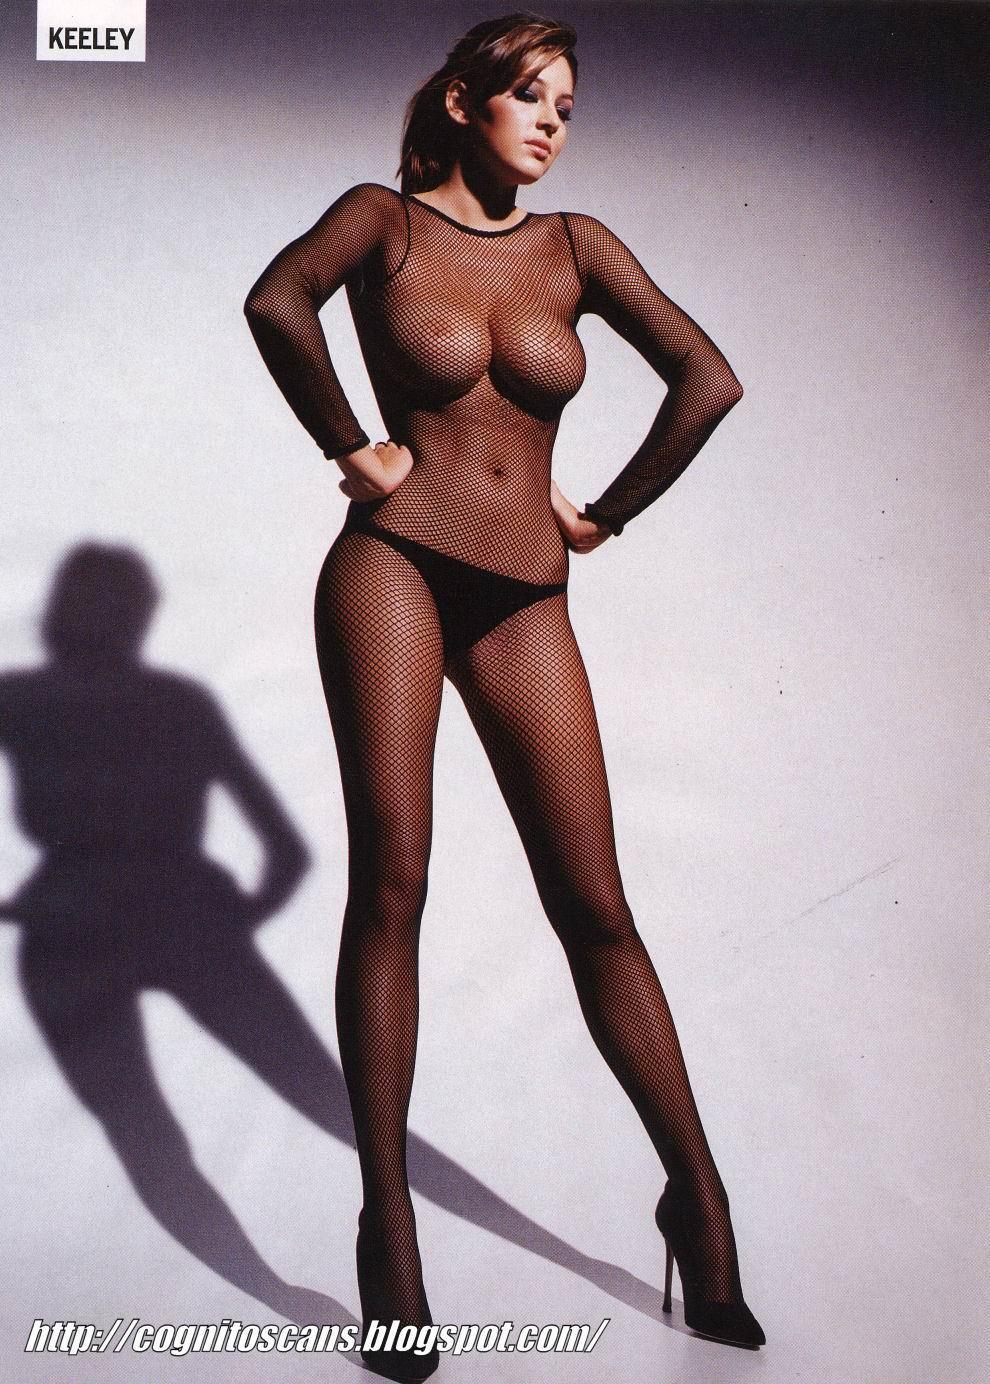 Keeley Hazell desnuda porno 2